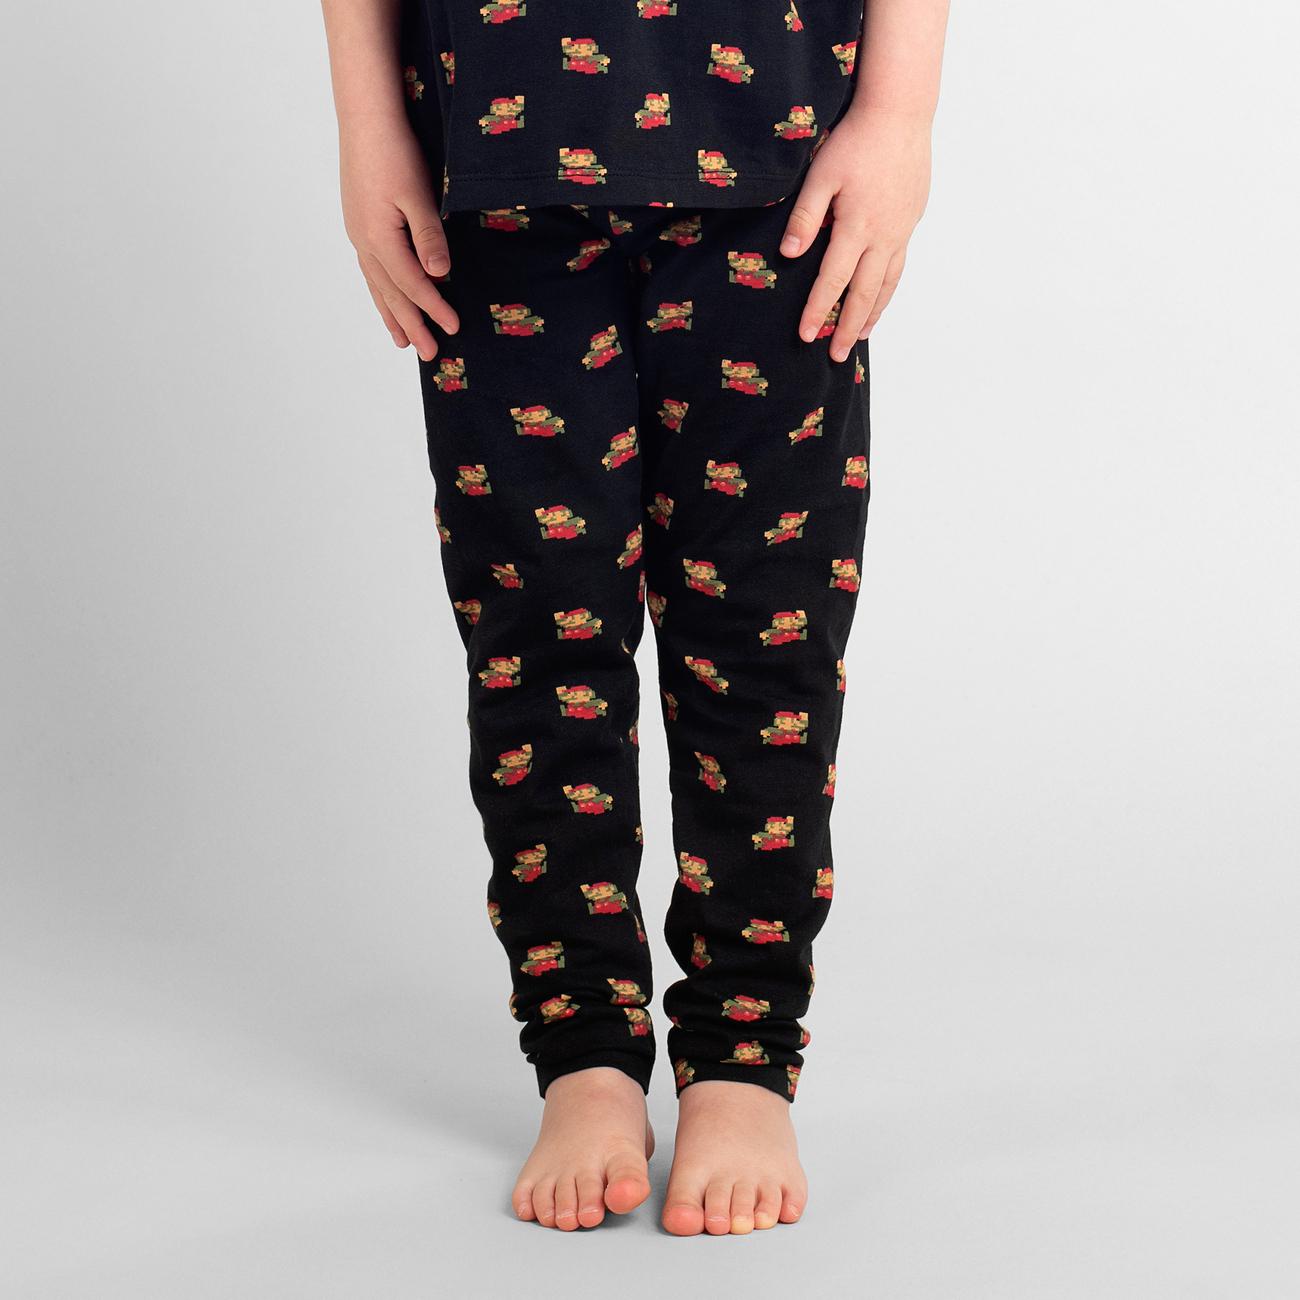 Leggings Lummelunda Super Mario Pattern Black